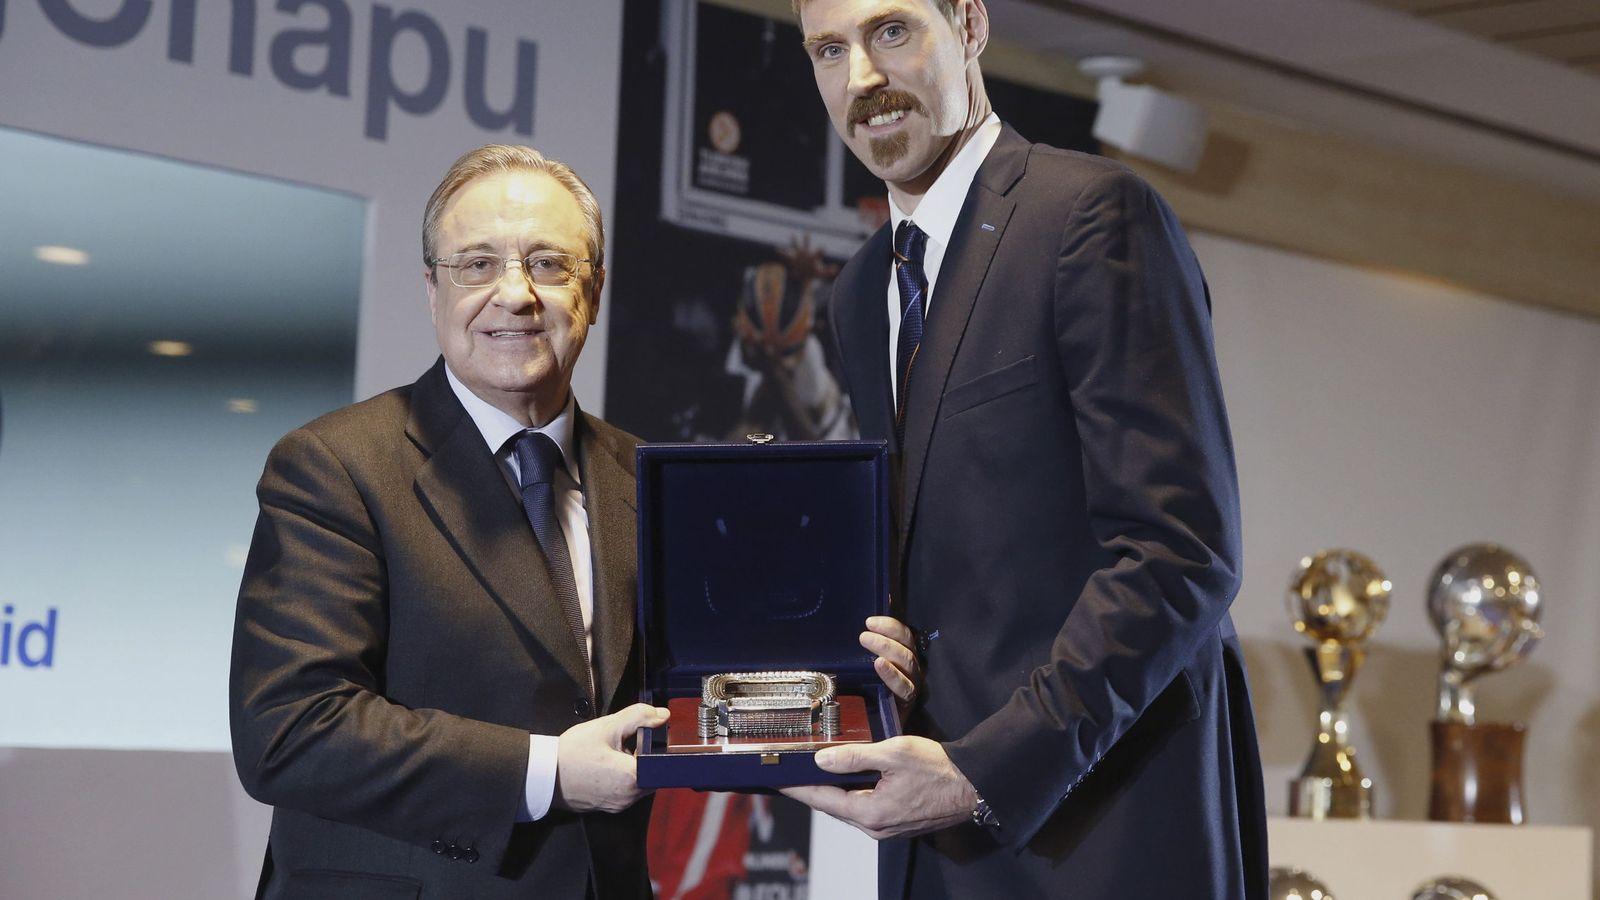 Foto: Florentino Pérez le entregó un obsequio a Andrés Nocioni en el homenaje que el club le rindió al jugador argentino este martes. (EFE)